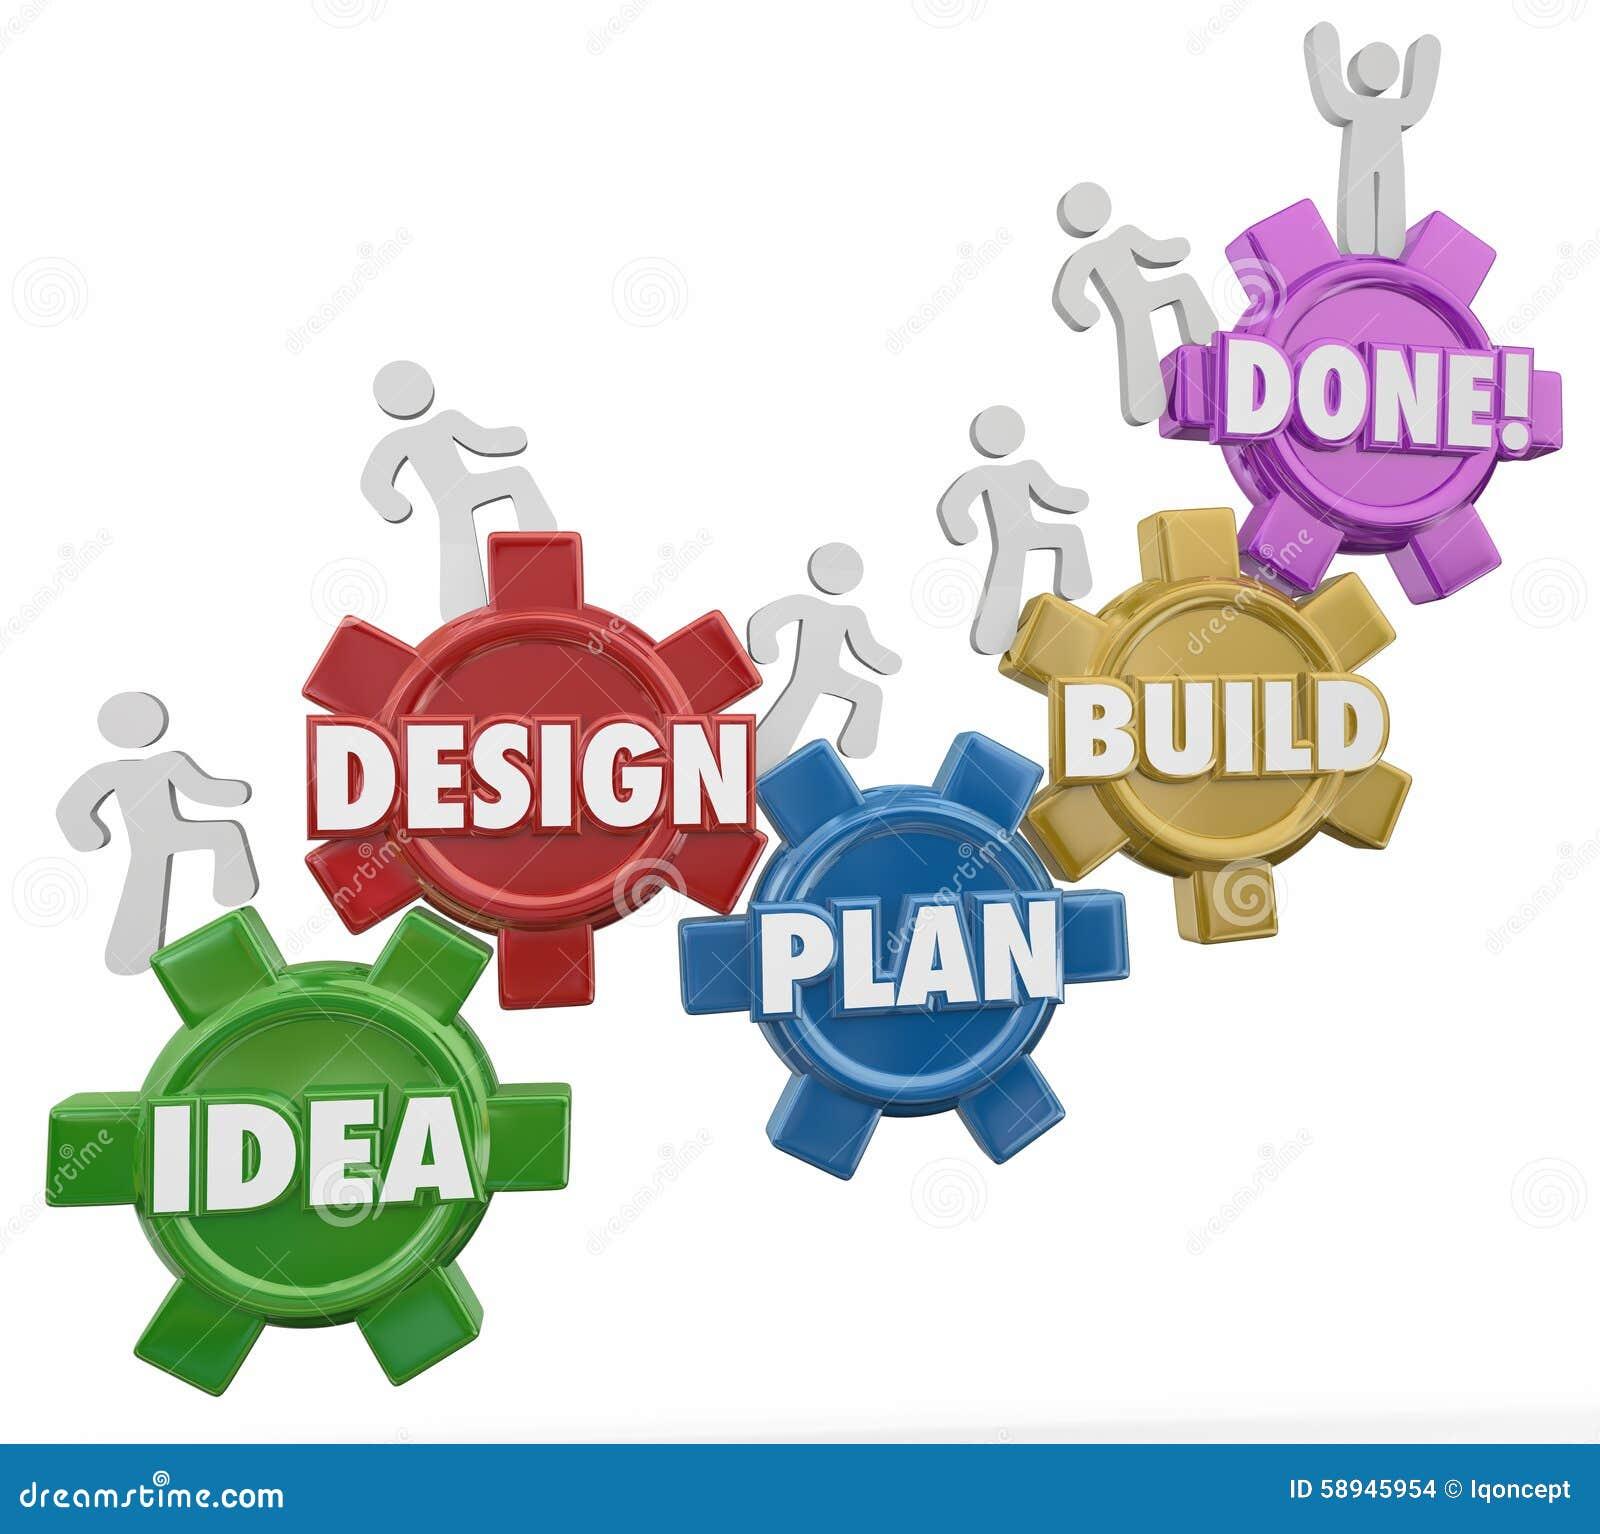 idea design plan build done instructions project job task. Black Bedroom Furniture Sets. Home Design Ideas